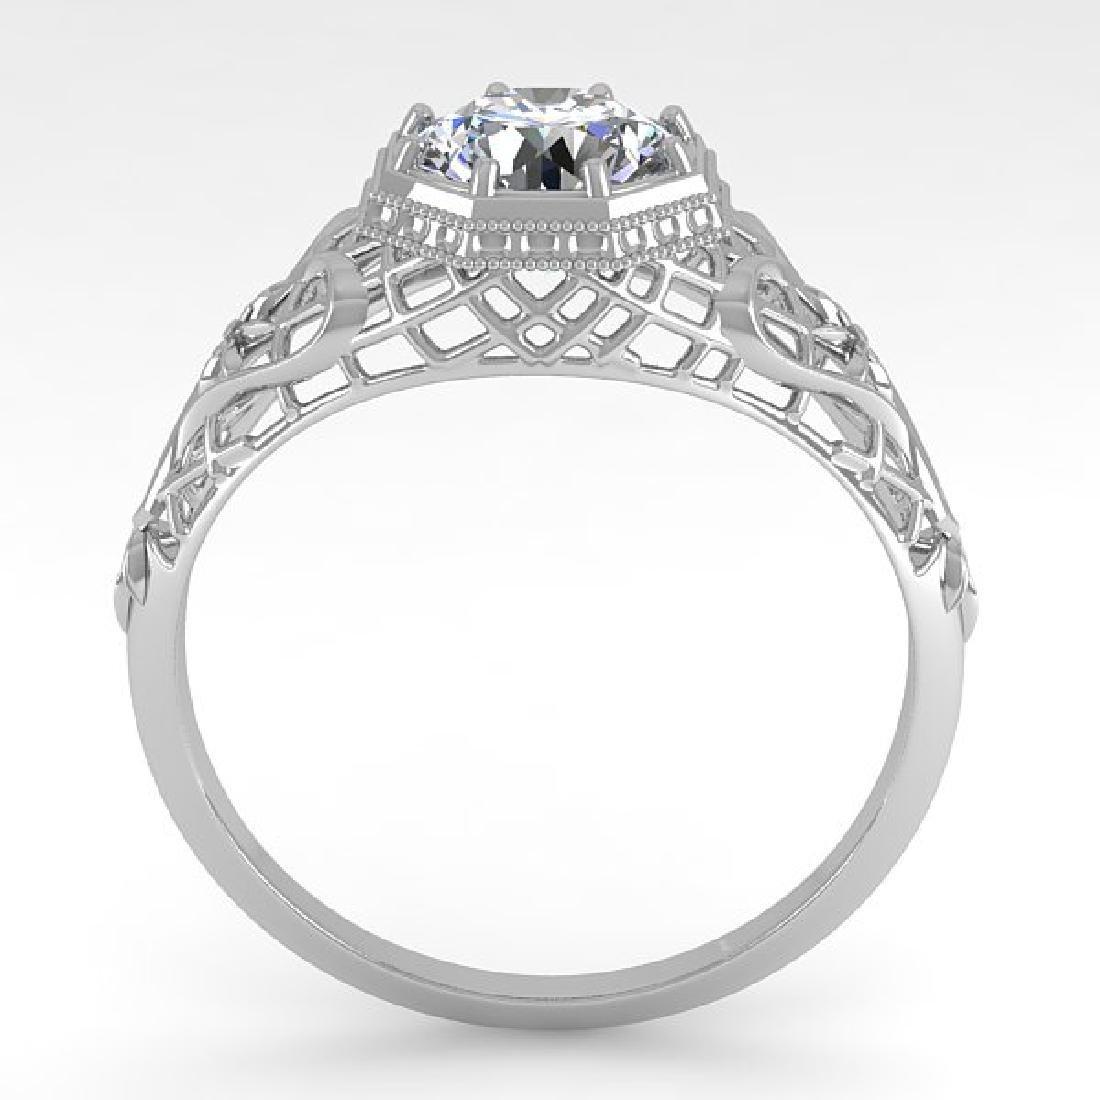 1.01 CTW VS/SI Diamond Solitaire Ring 14K White Gold - 3